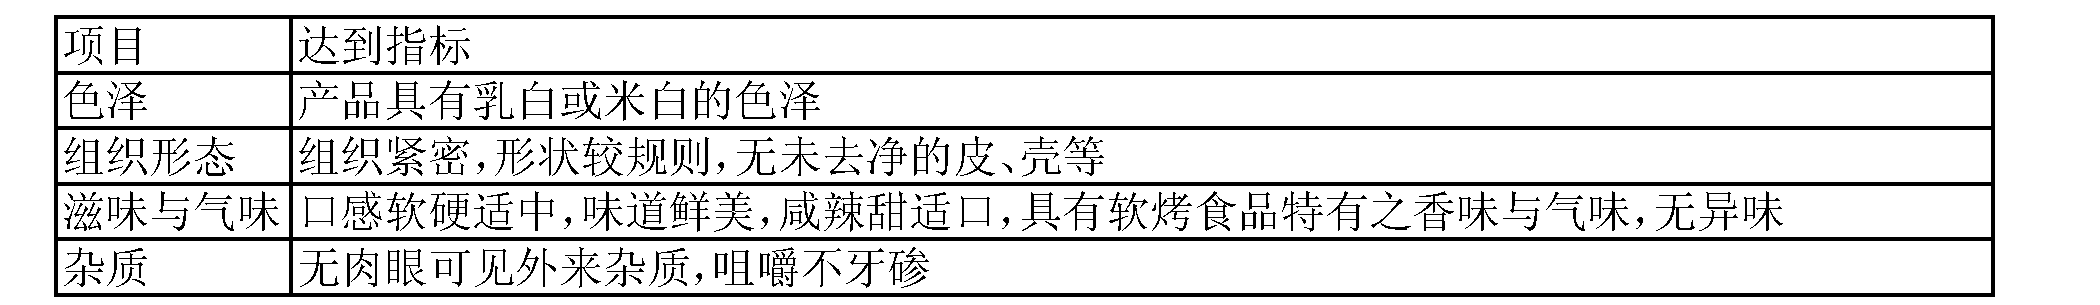 Figure CN102948827AD00061